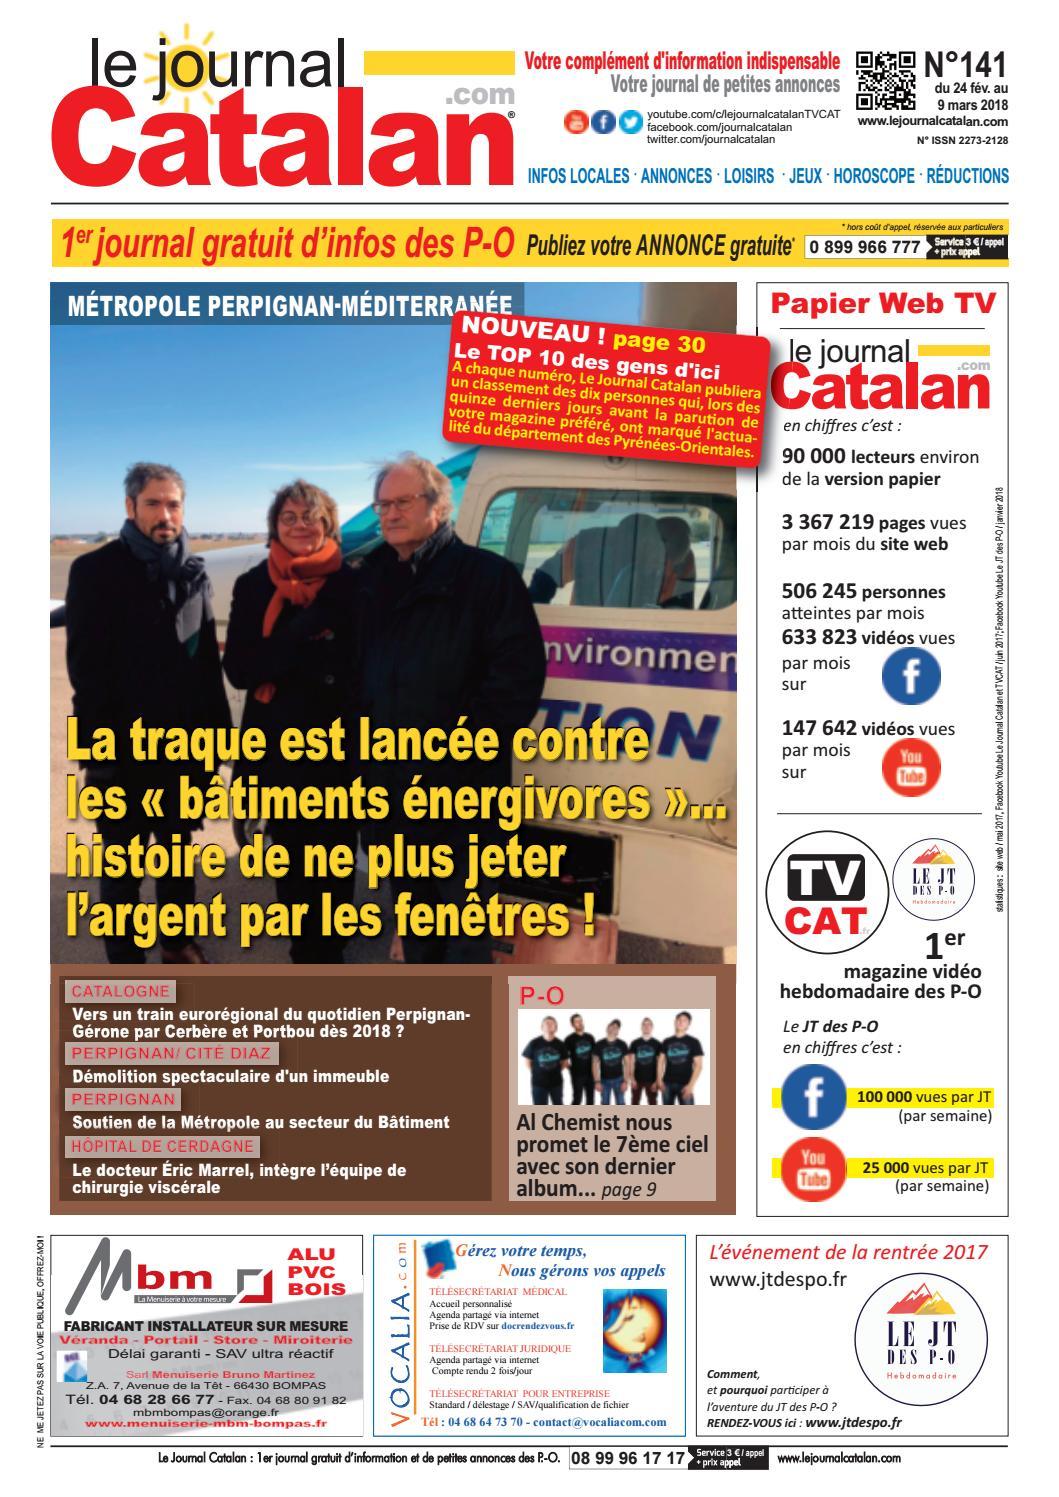 ° by Pyrénées N Le 141 LE Orientales Catalan Journal iTwPkuOZX